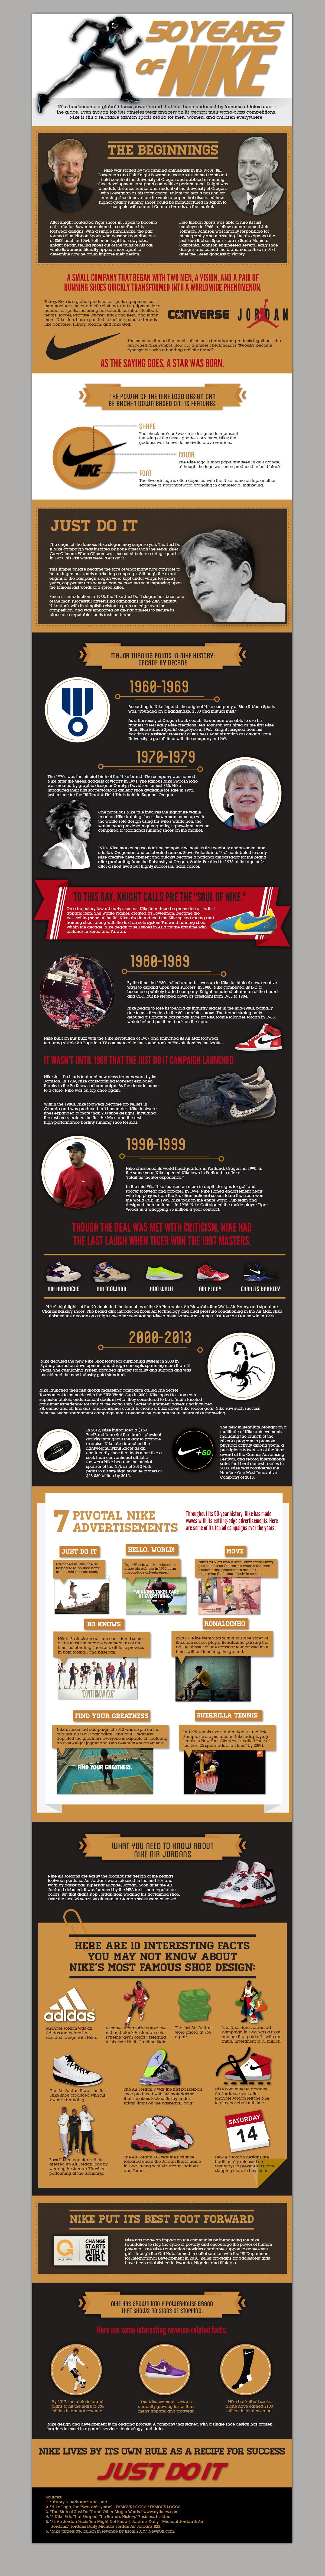 50 years of nike